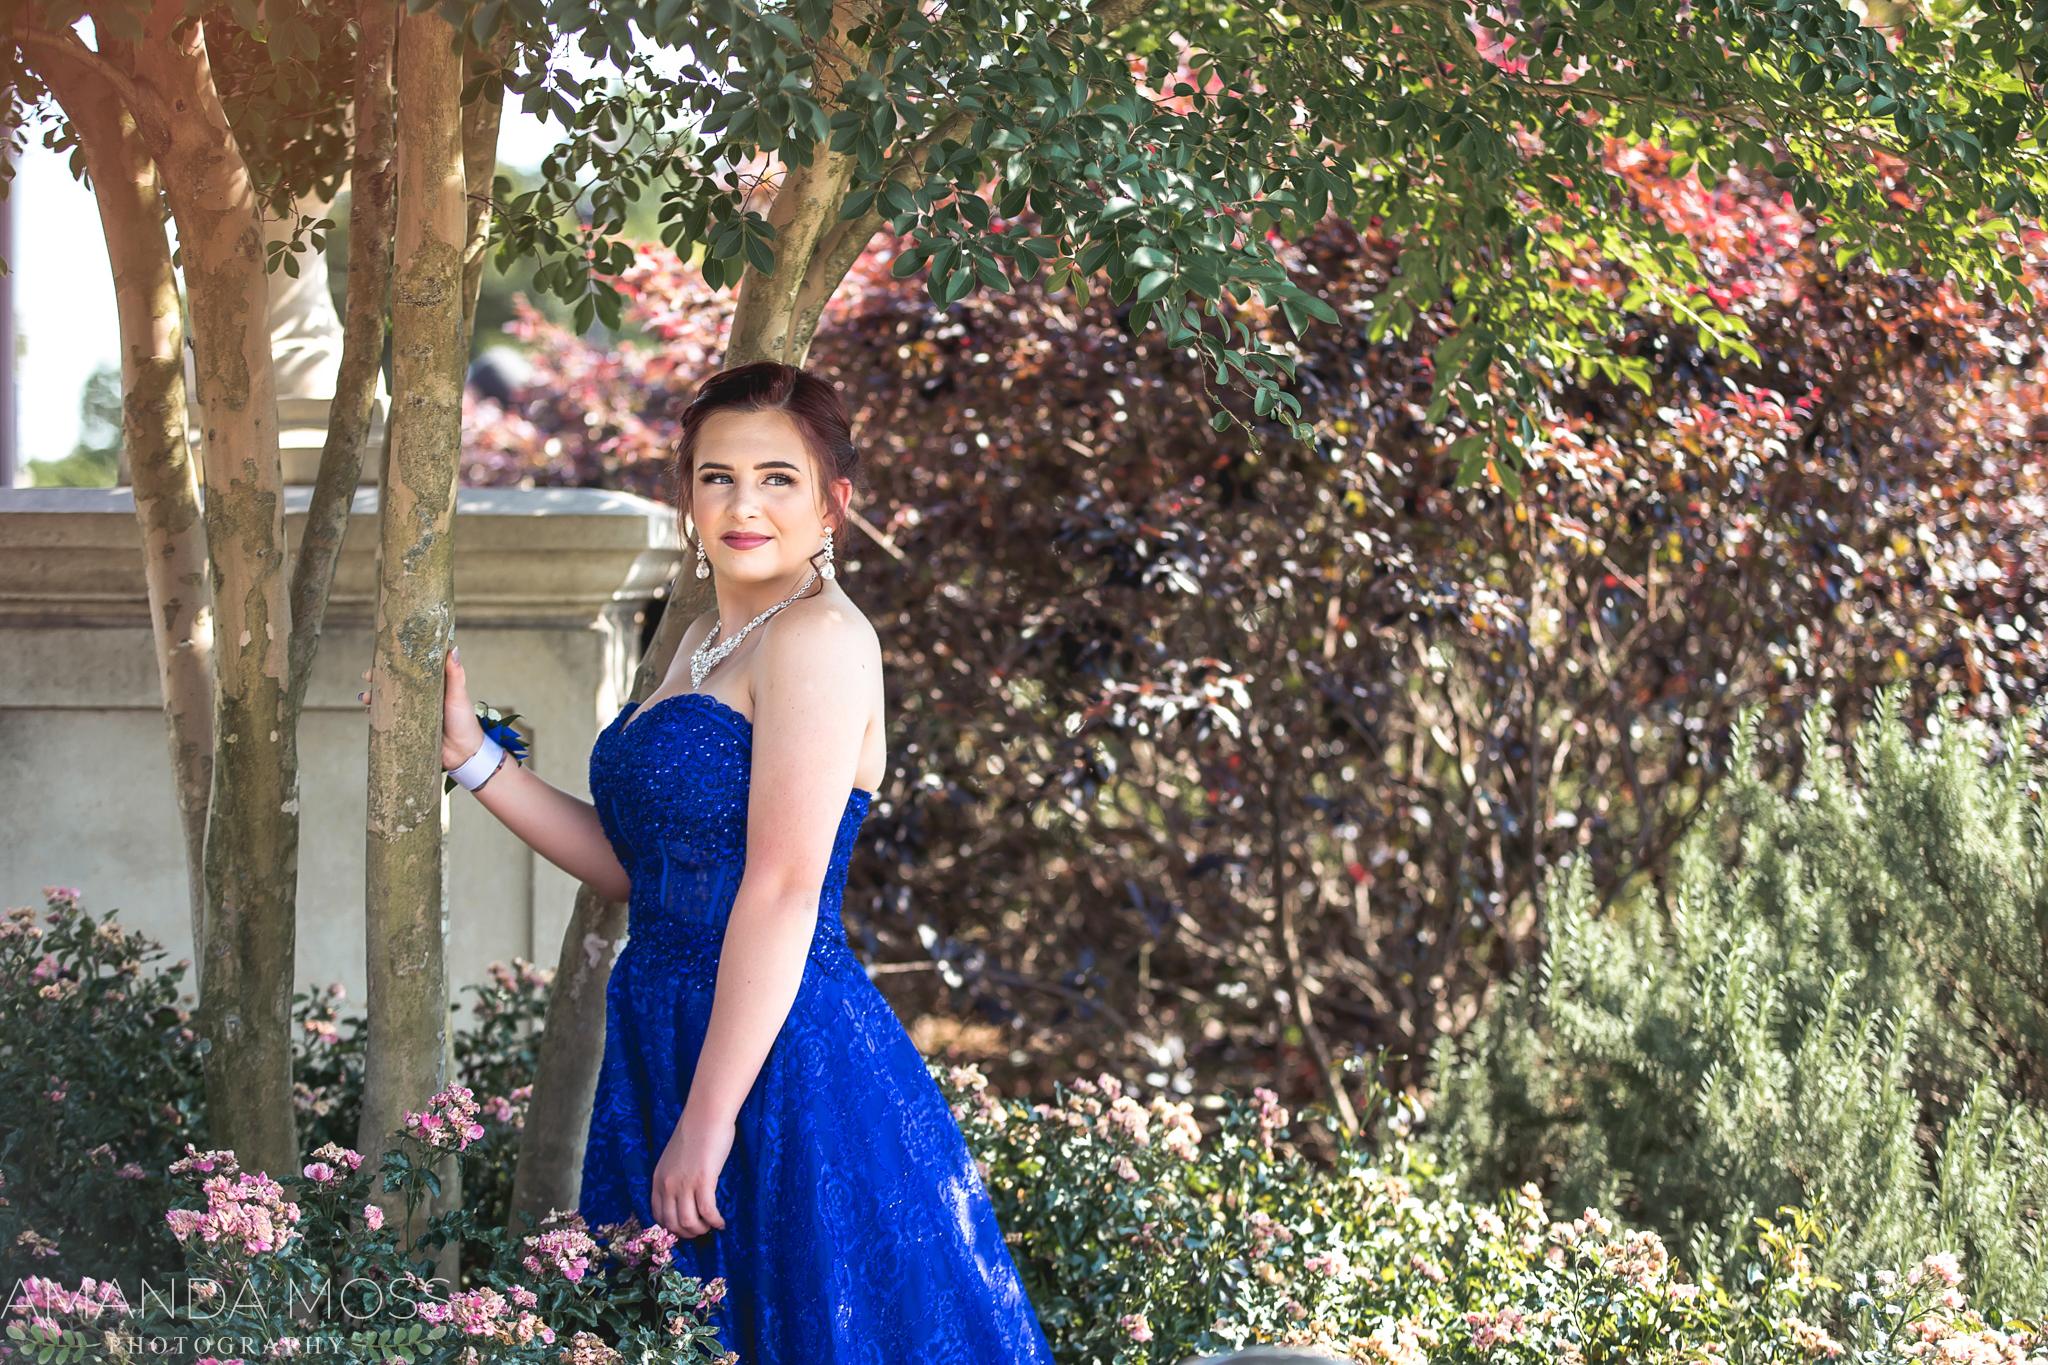 charlotte north carolina portrait photographer prom session midtown park skyline